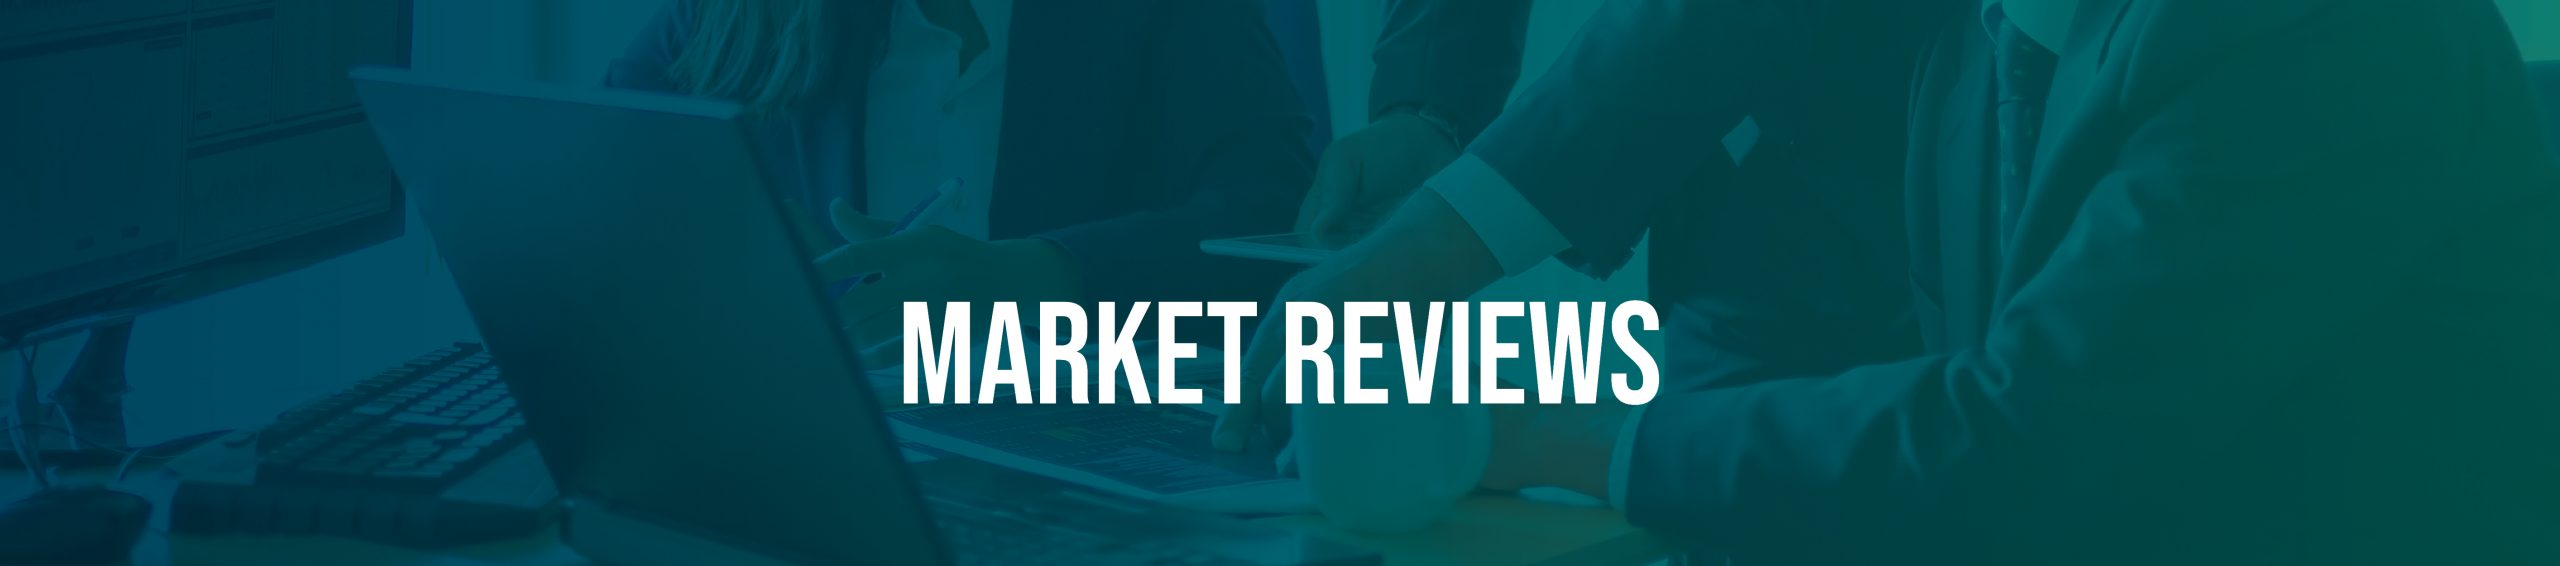 Market Reviews